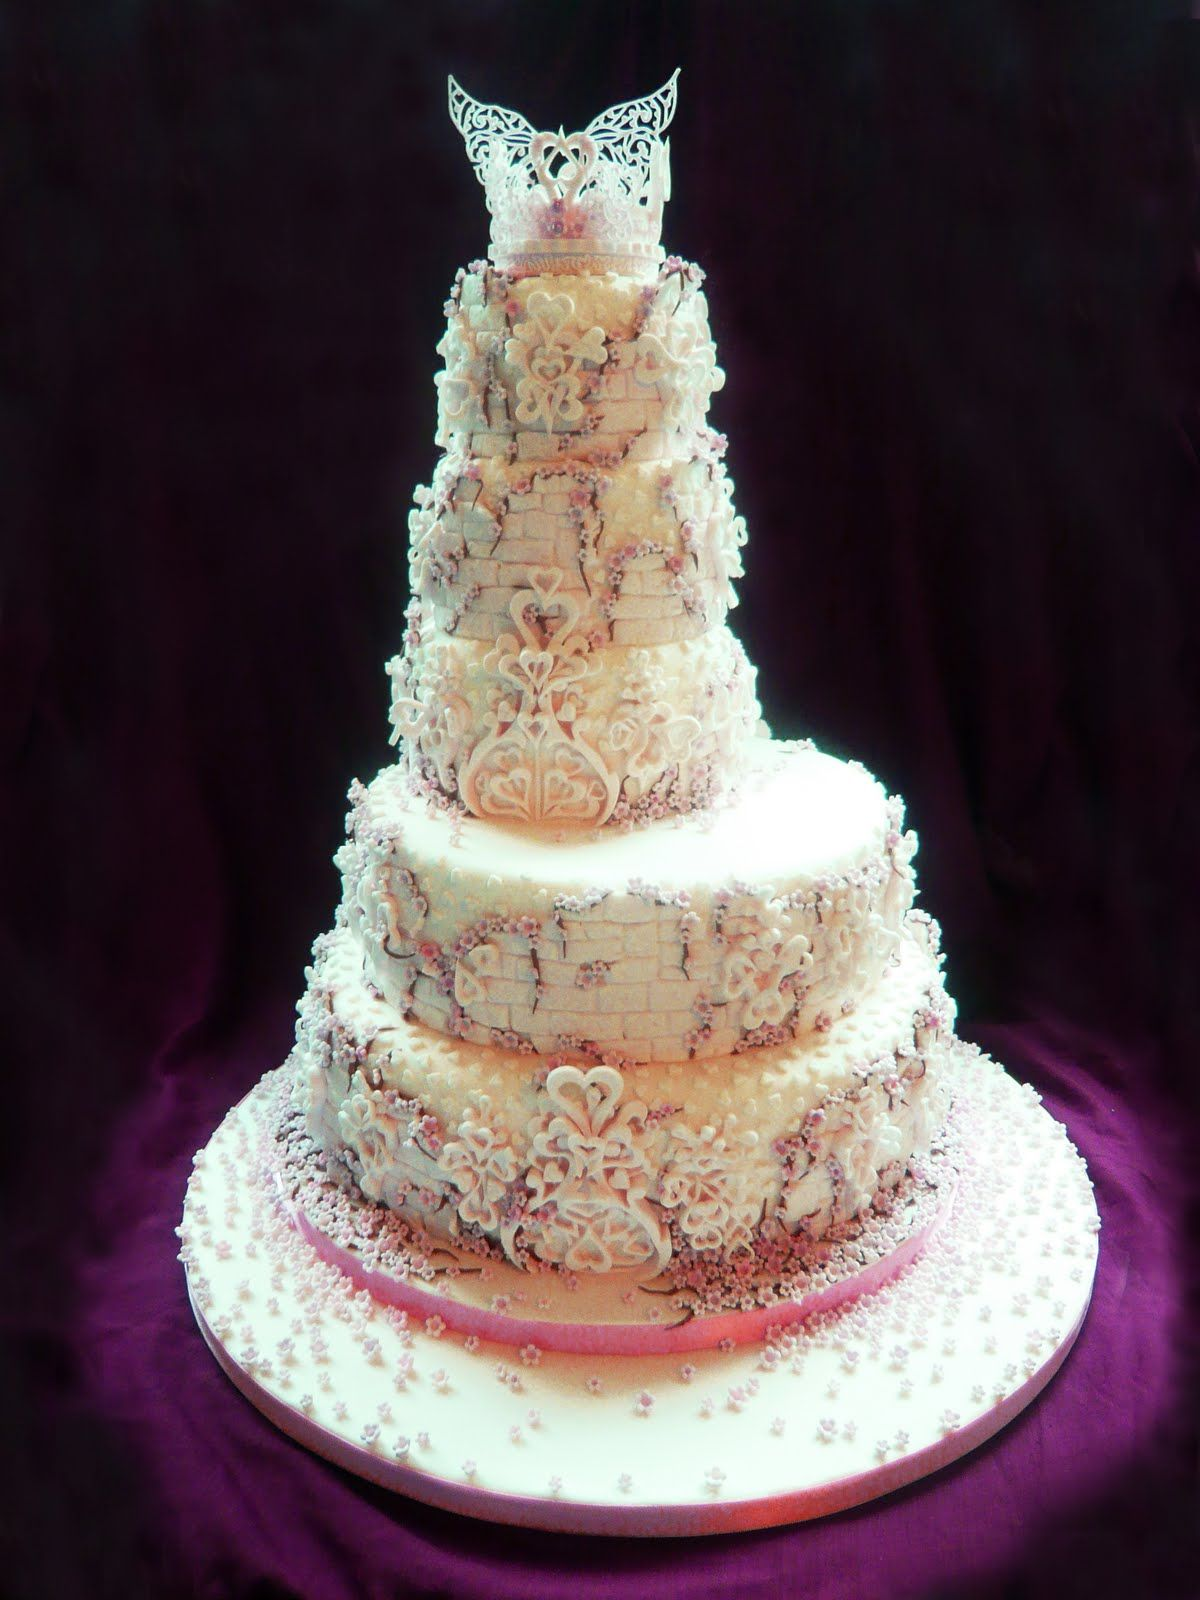 castleweddingcakes white dragon and castle wedding cake